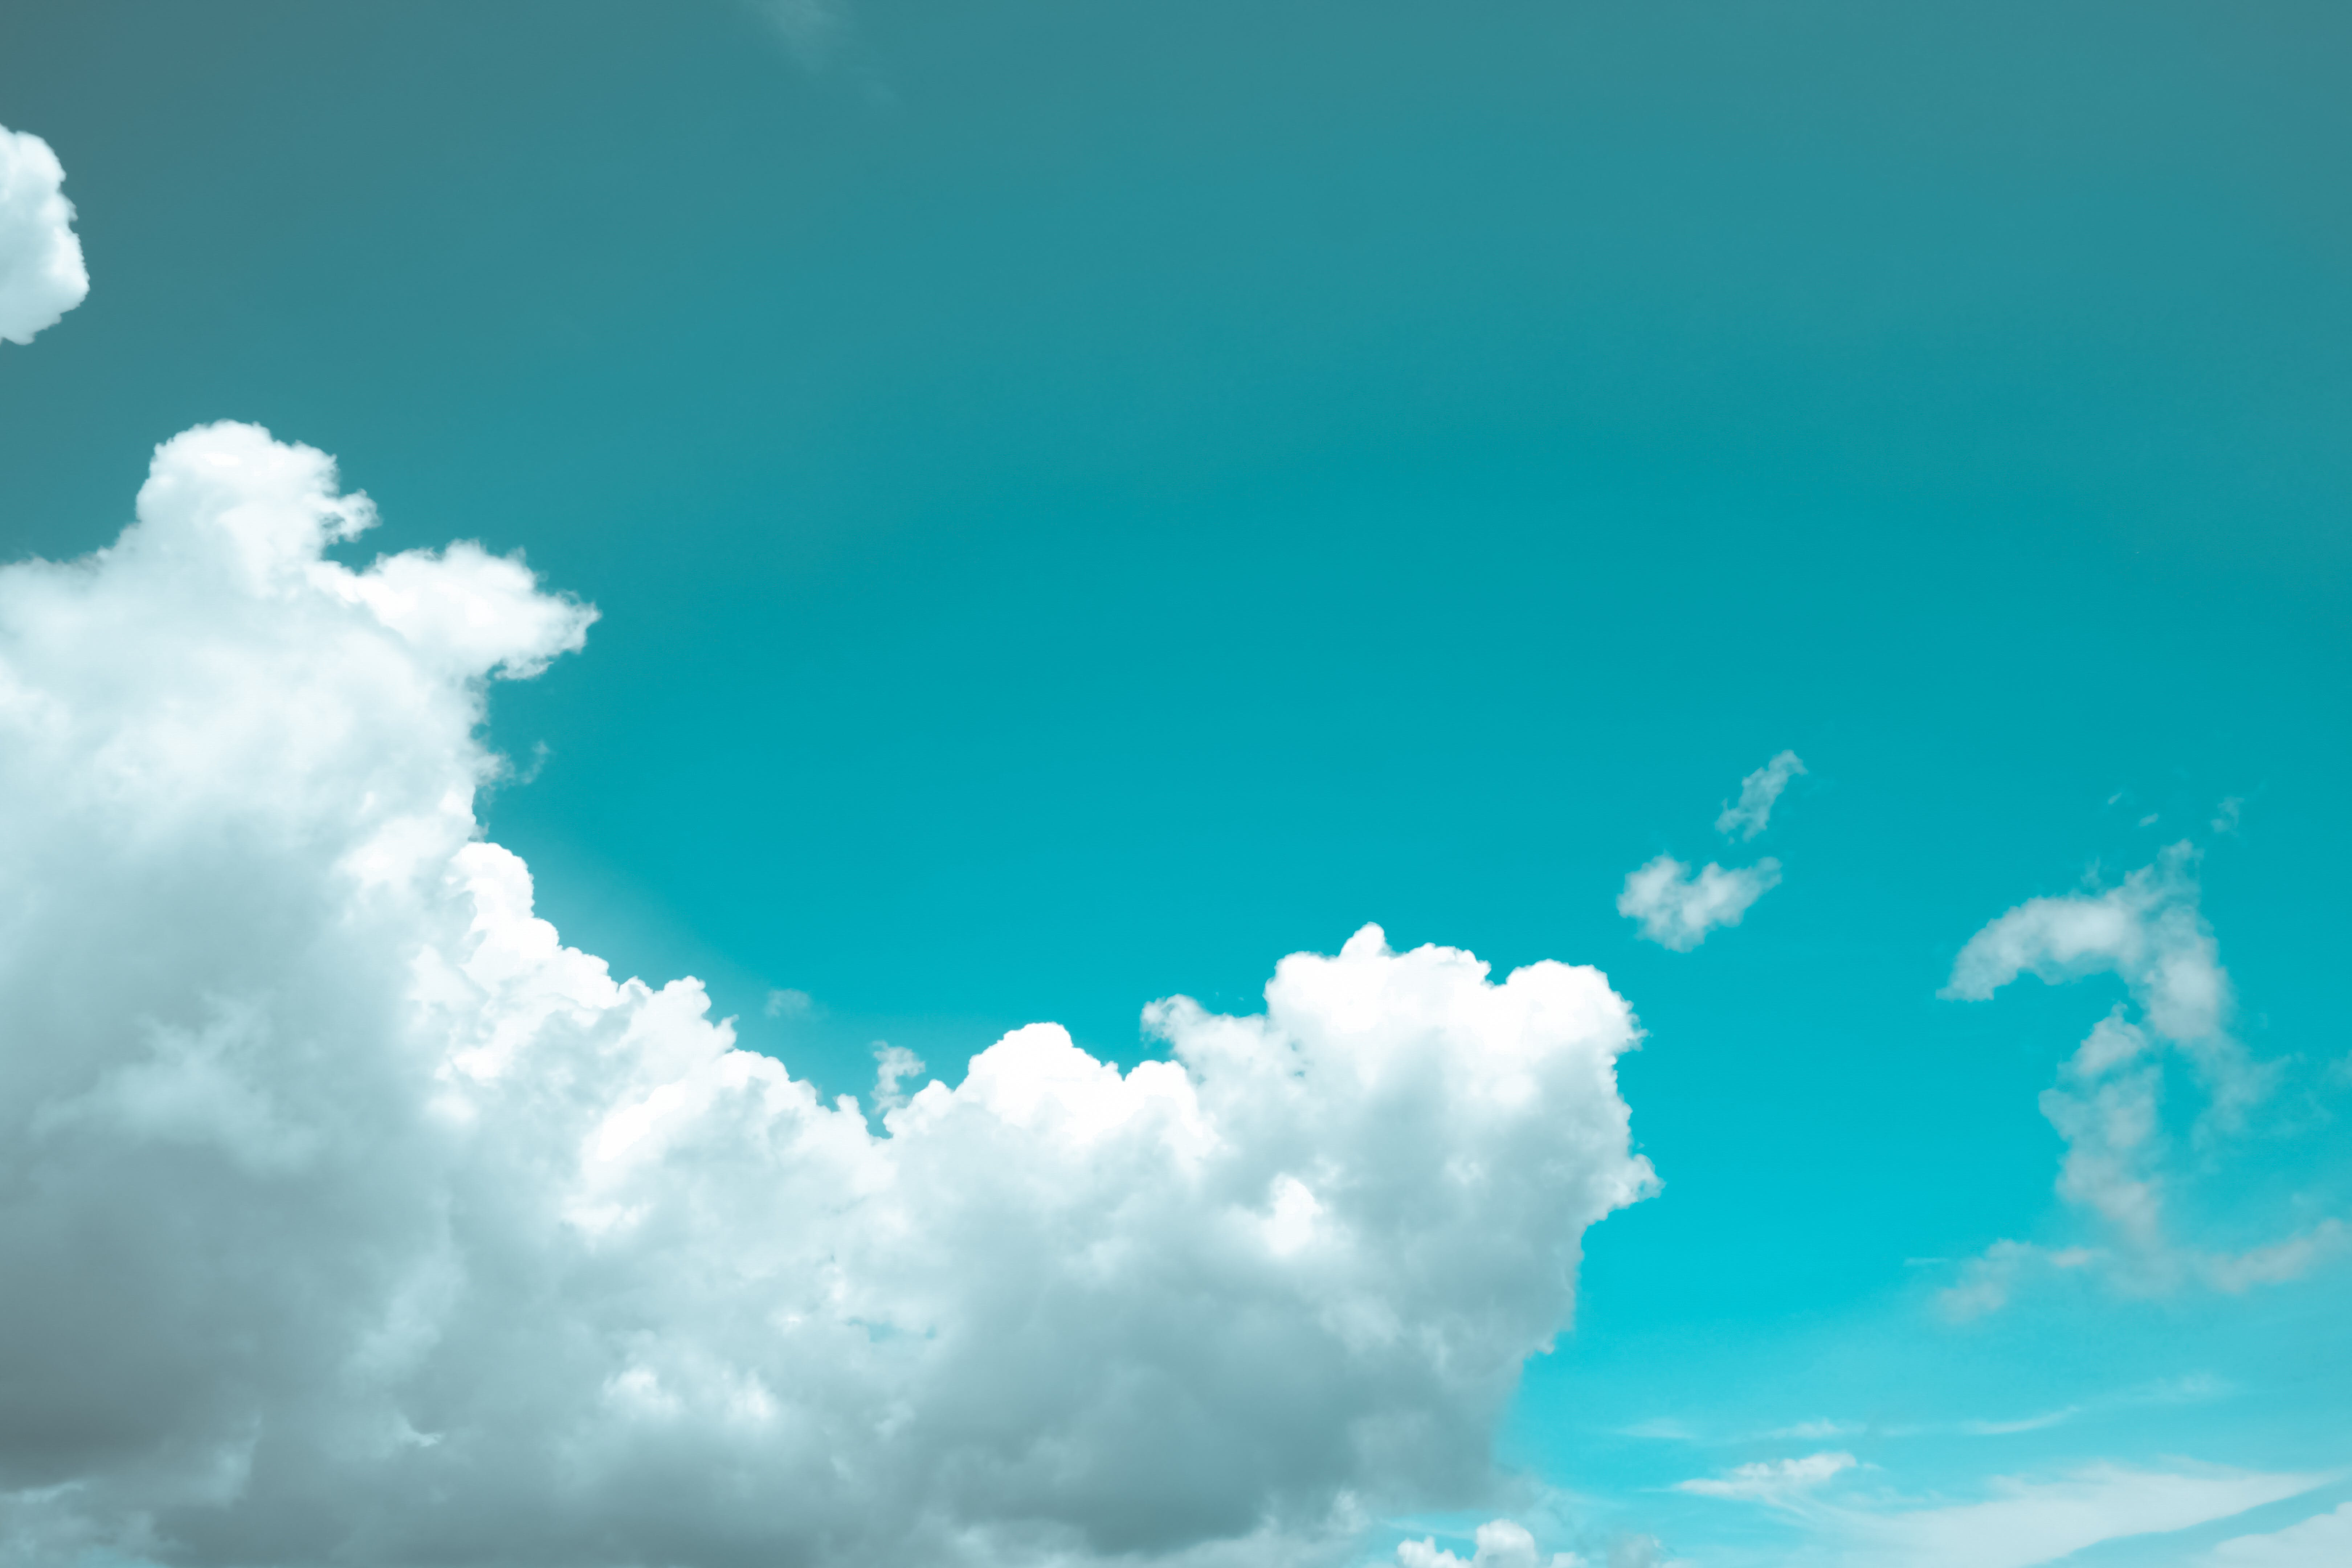 White Cloudy Blue Sky